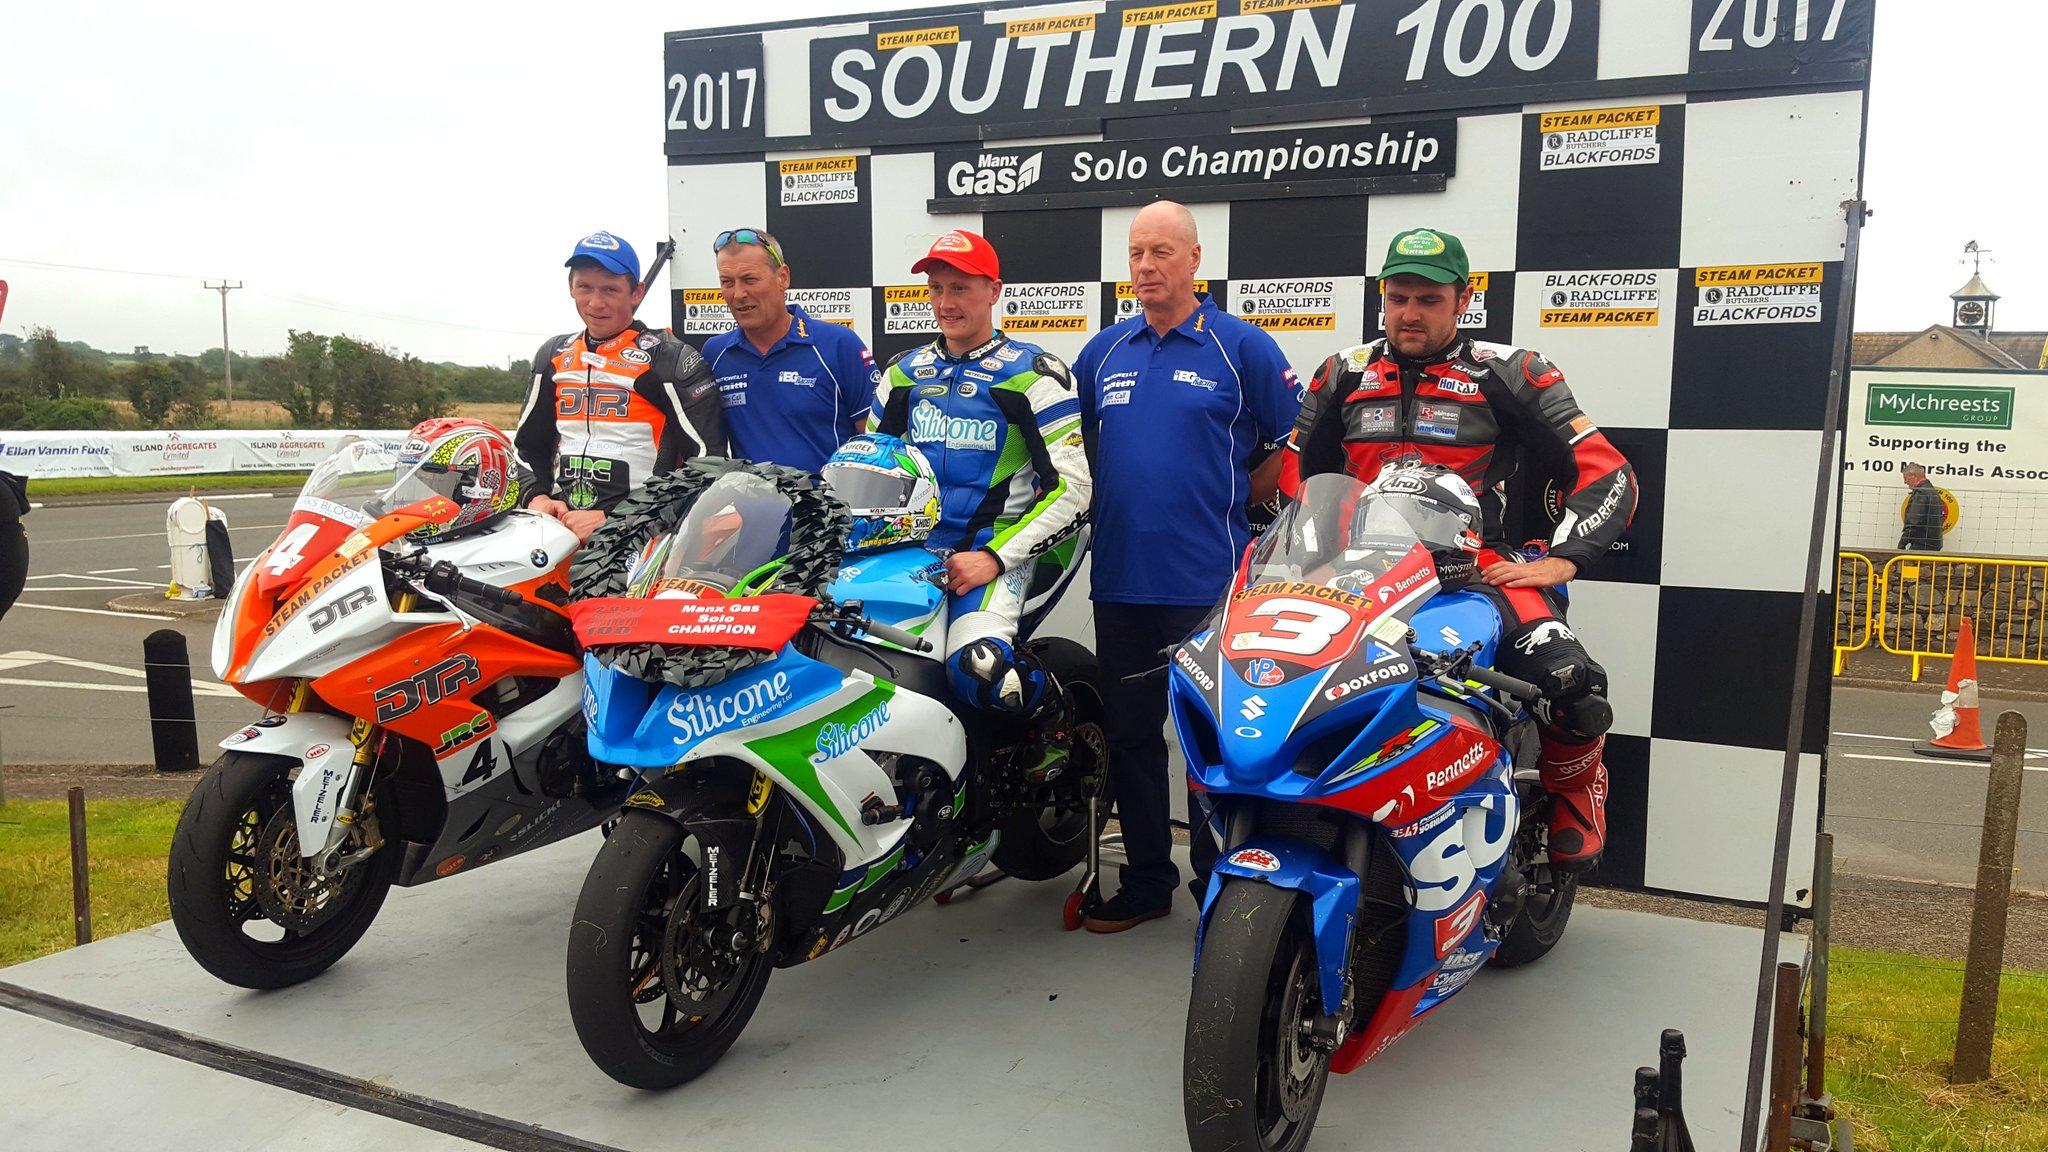 Souther 100 Champion Dean Harrison